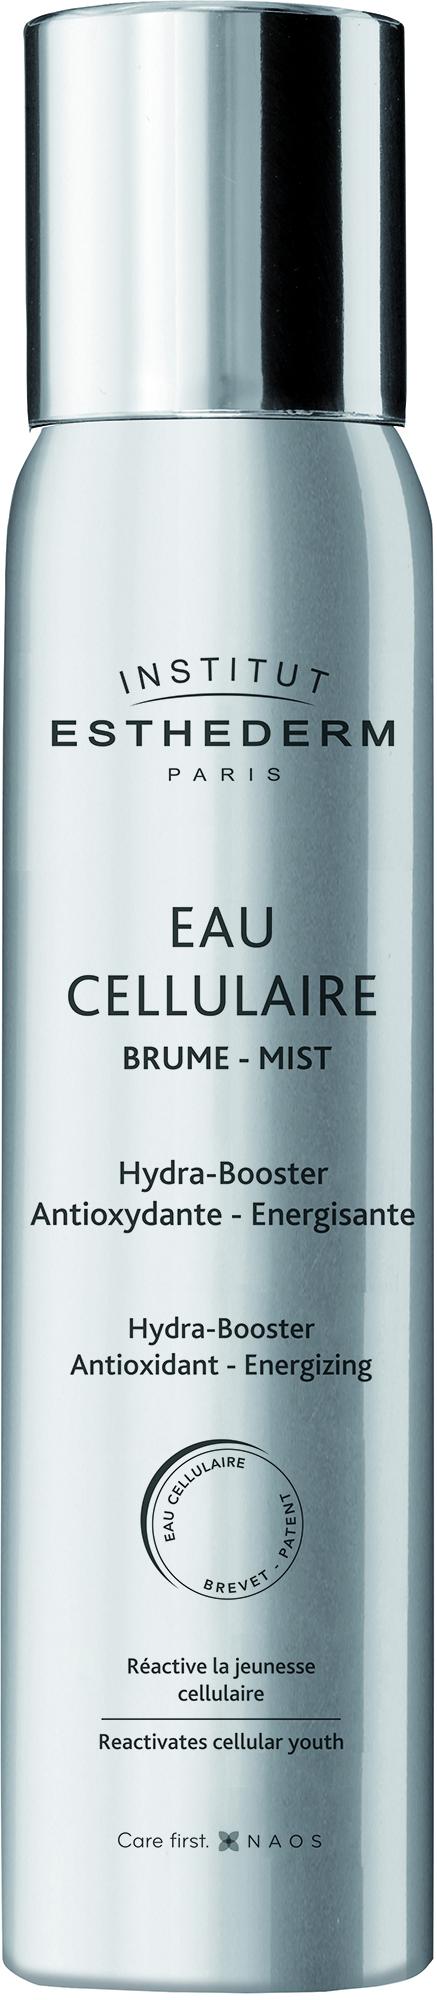 Institut Esthederm's Cellular Water Mist